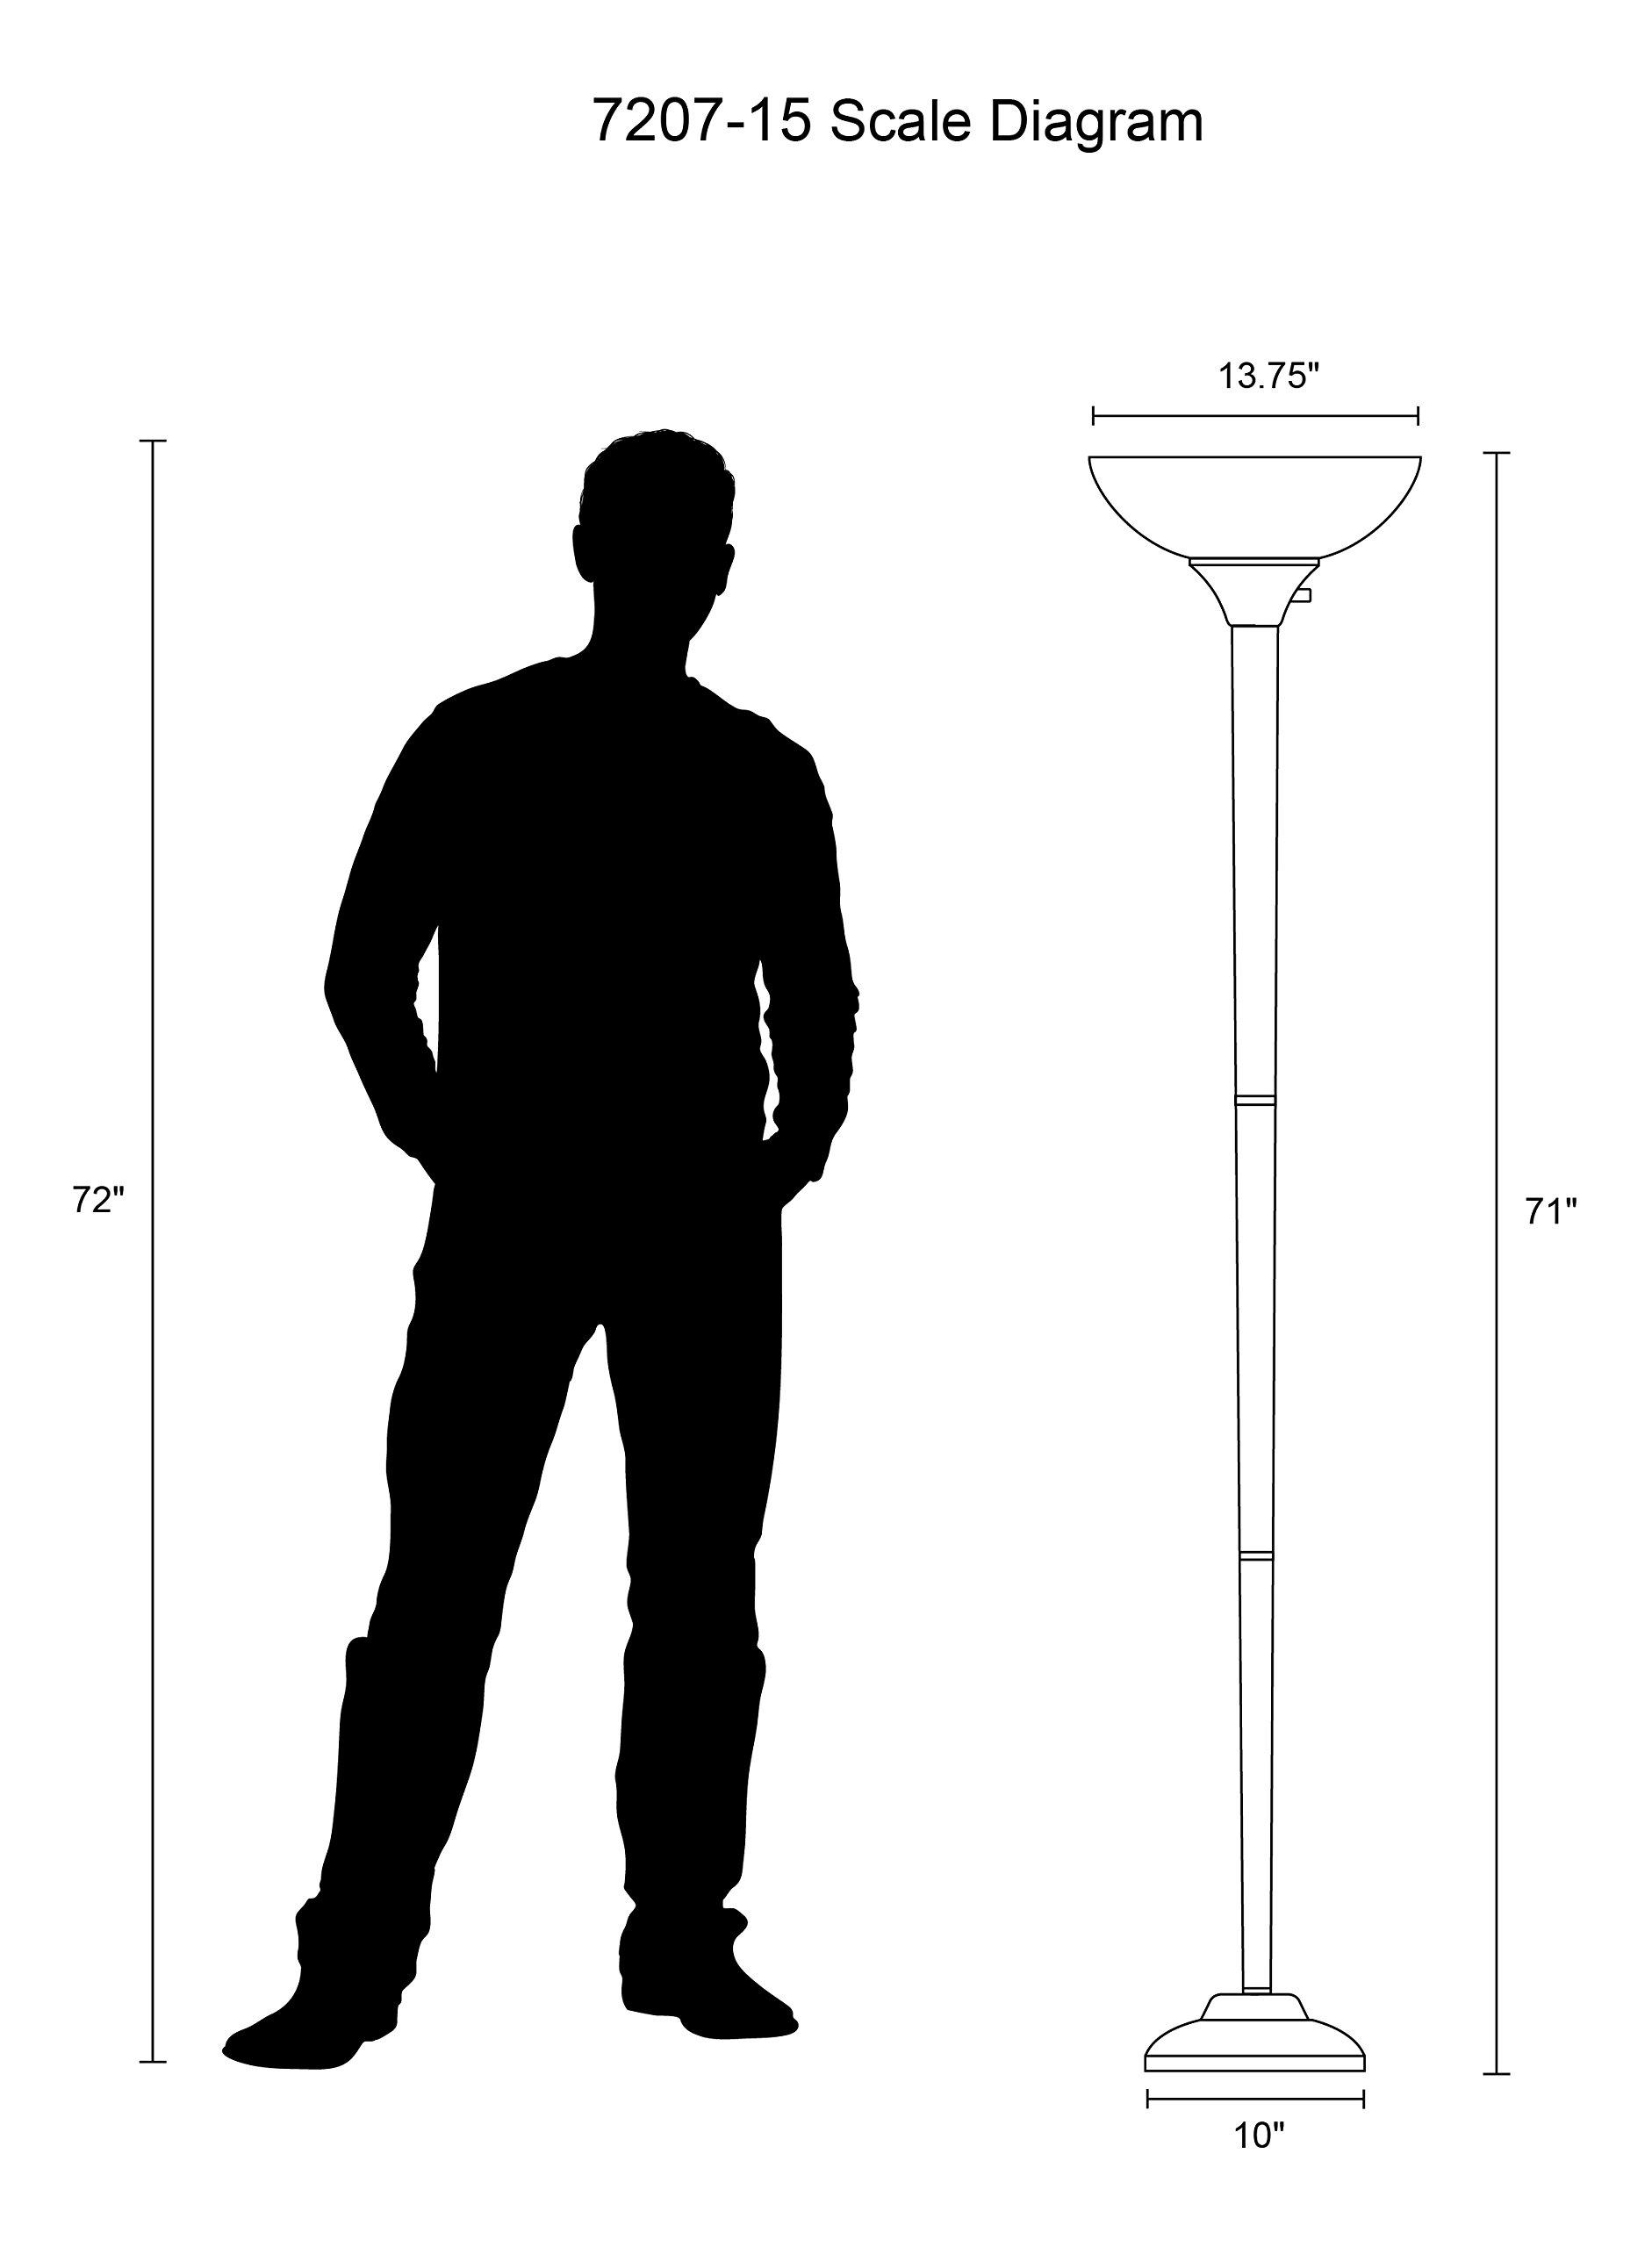 Galleon ikea 10139879 not floor uplight lamp 69 inch for Ikea floor uplight reading lamp 69 black